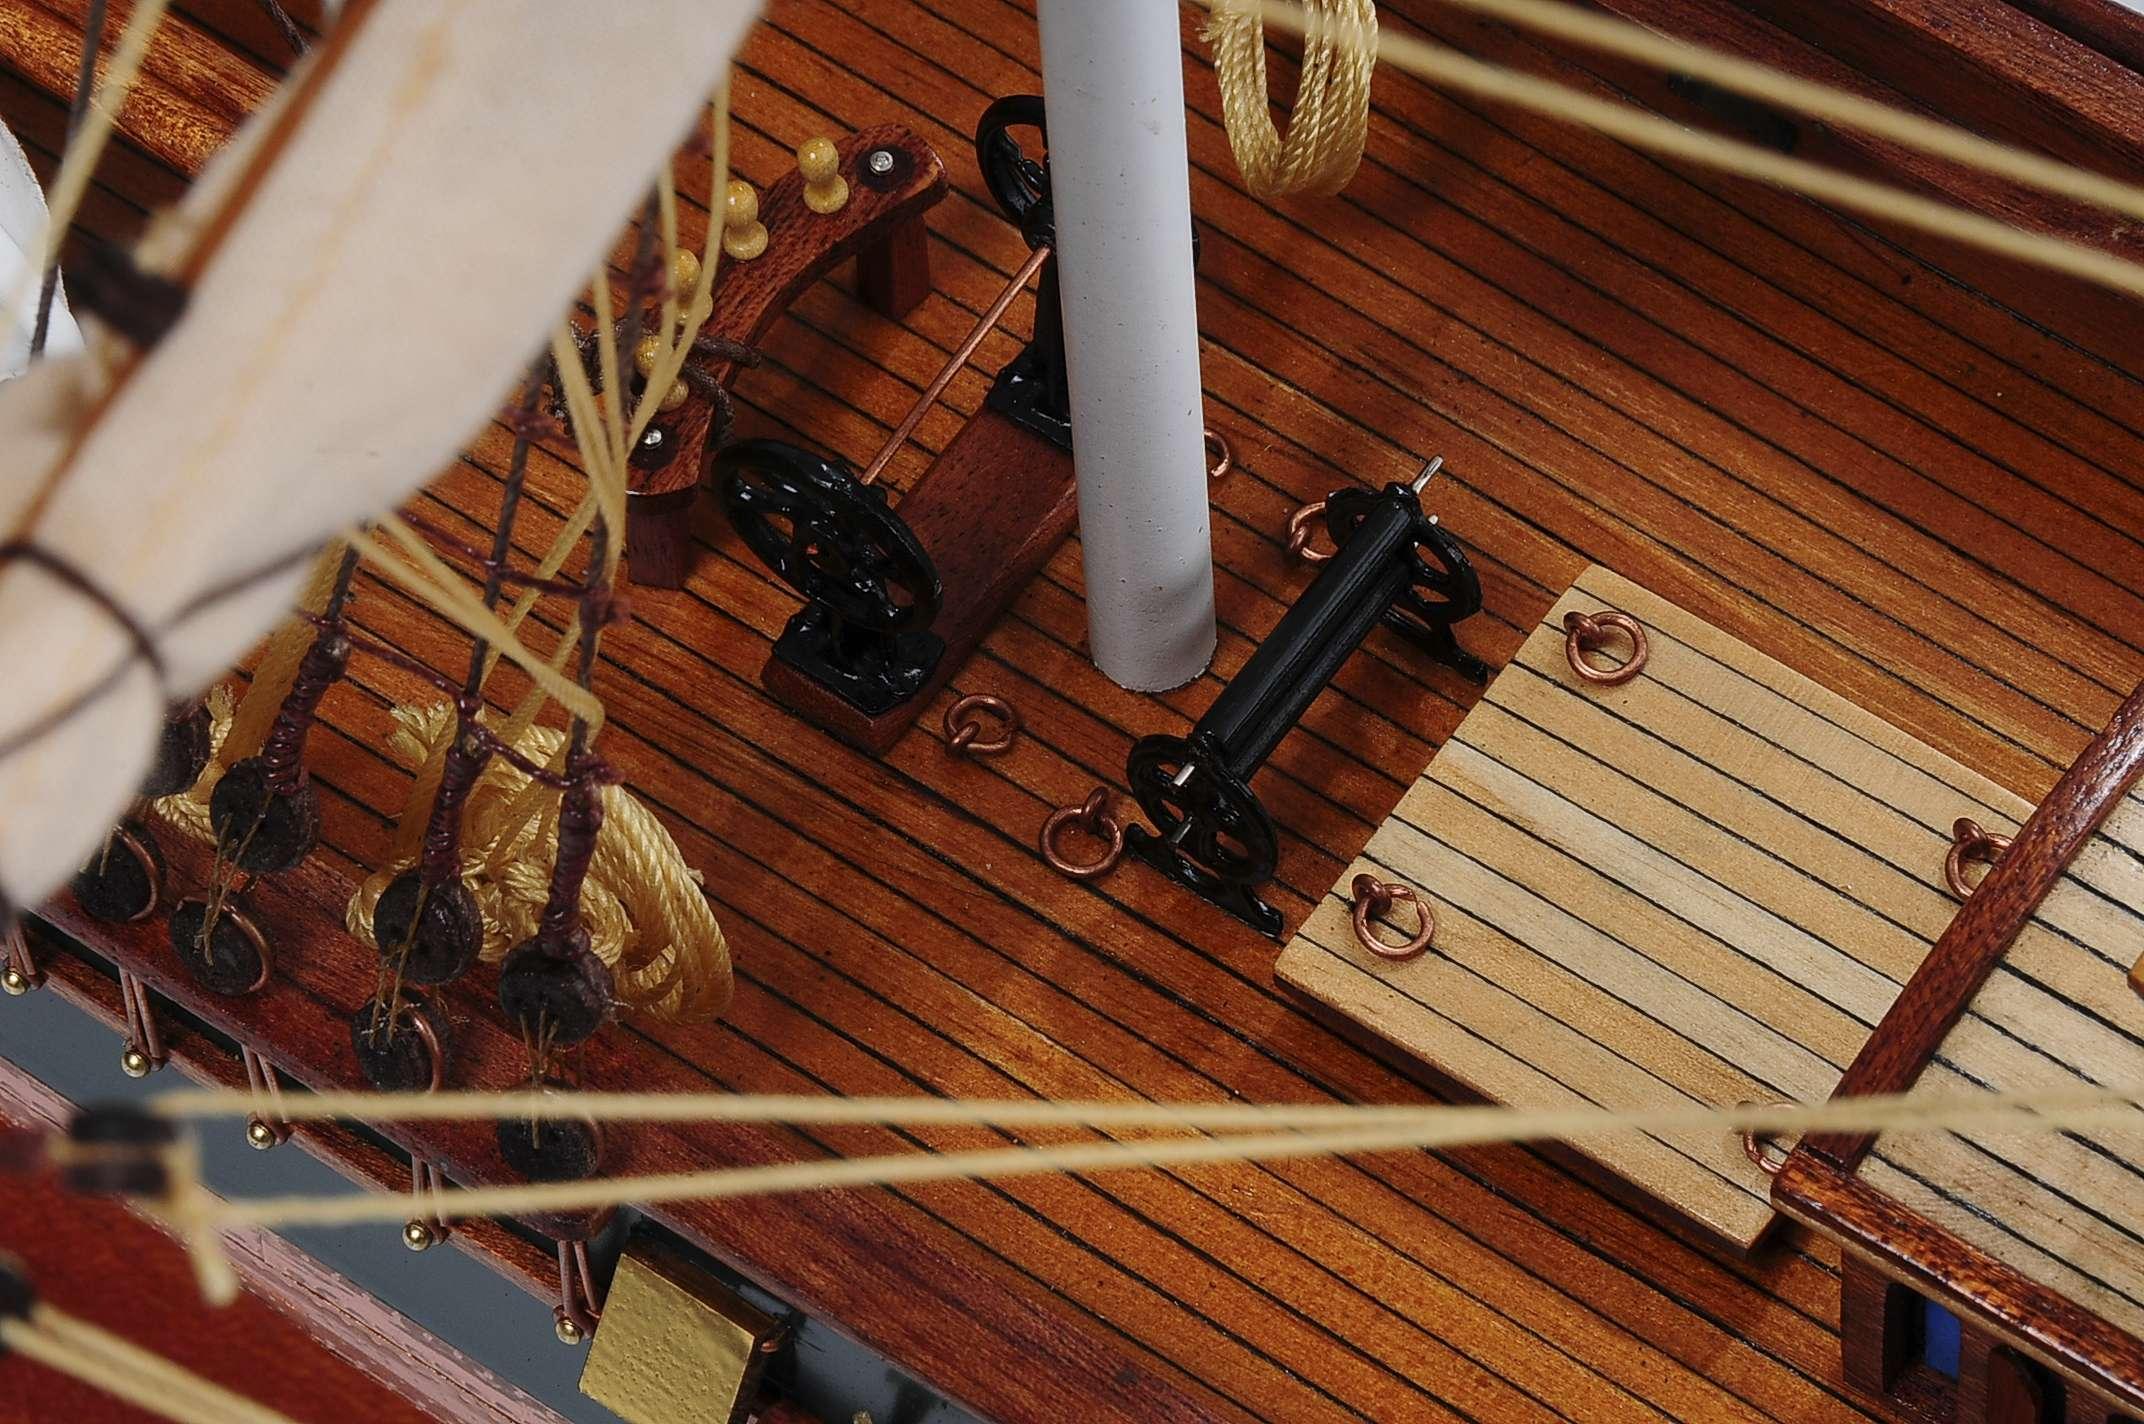 1434-4872-Thermopylae-Model-Boat